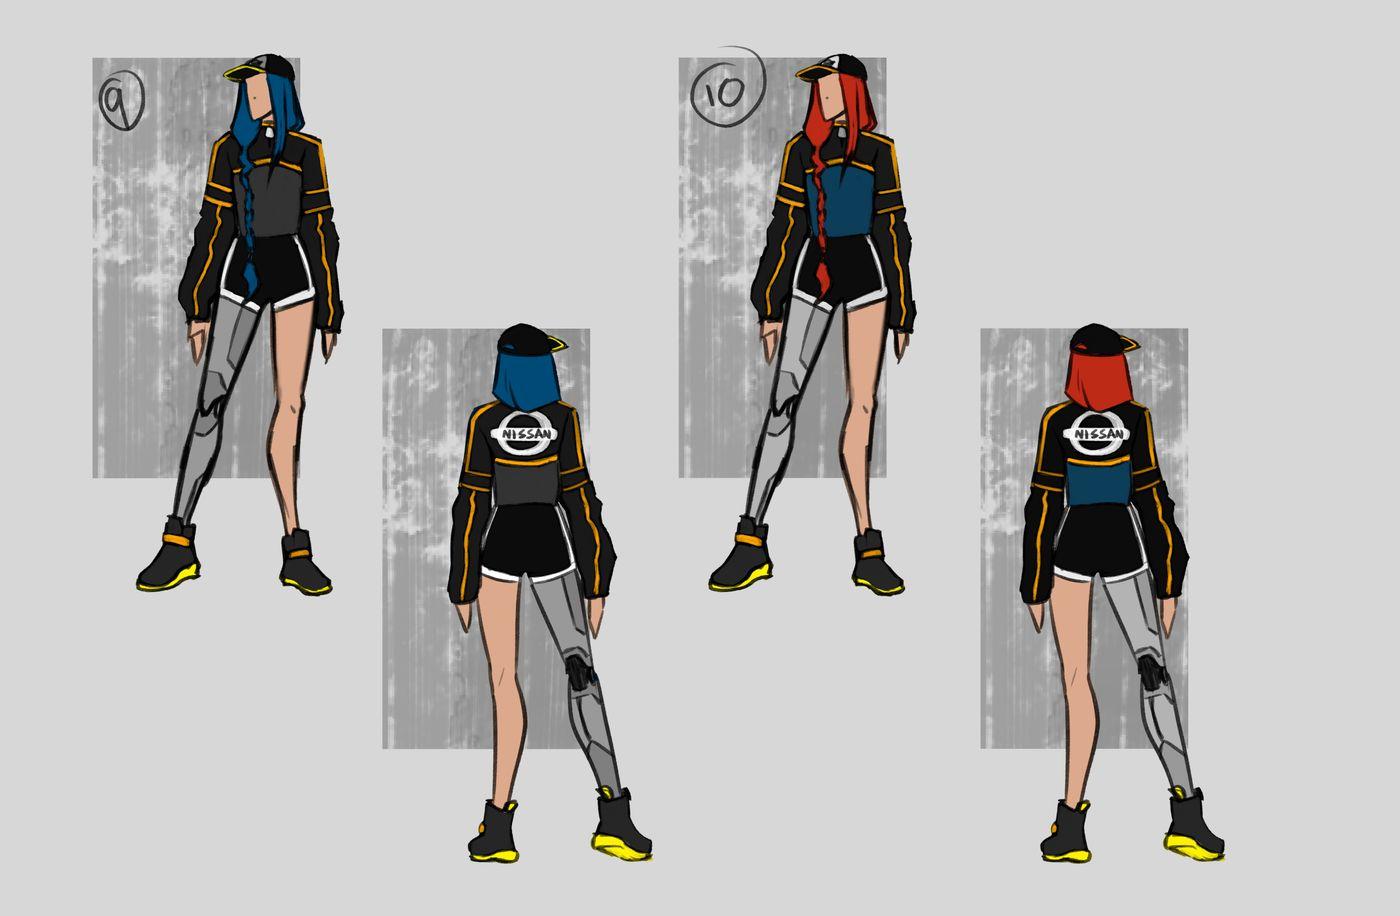 Steer Jasmine %20 Scme3420 Rookies %20 Character Design Colour Passes05 Jasminesteer